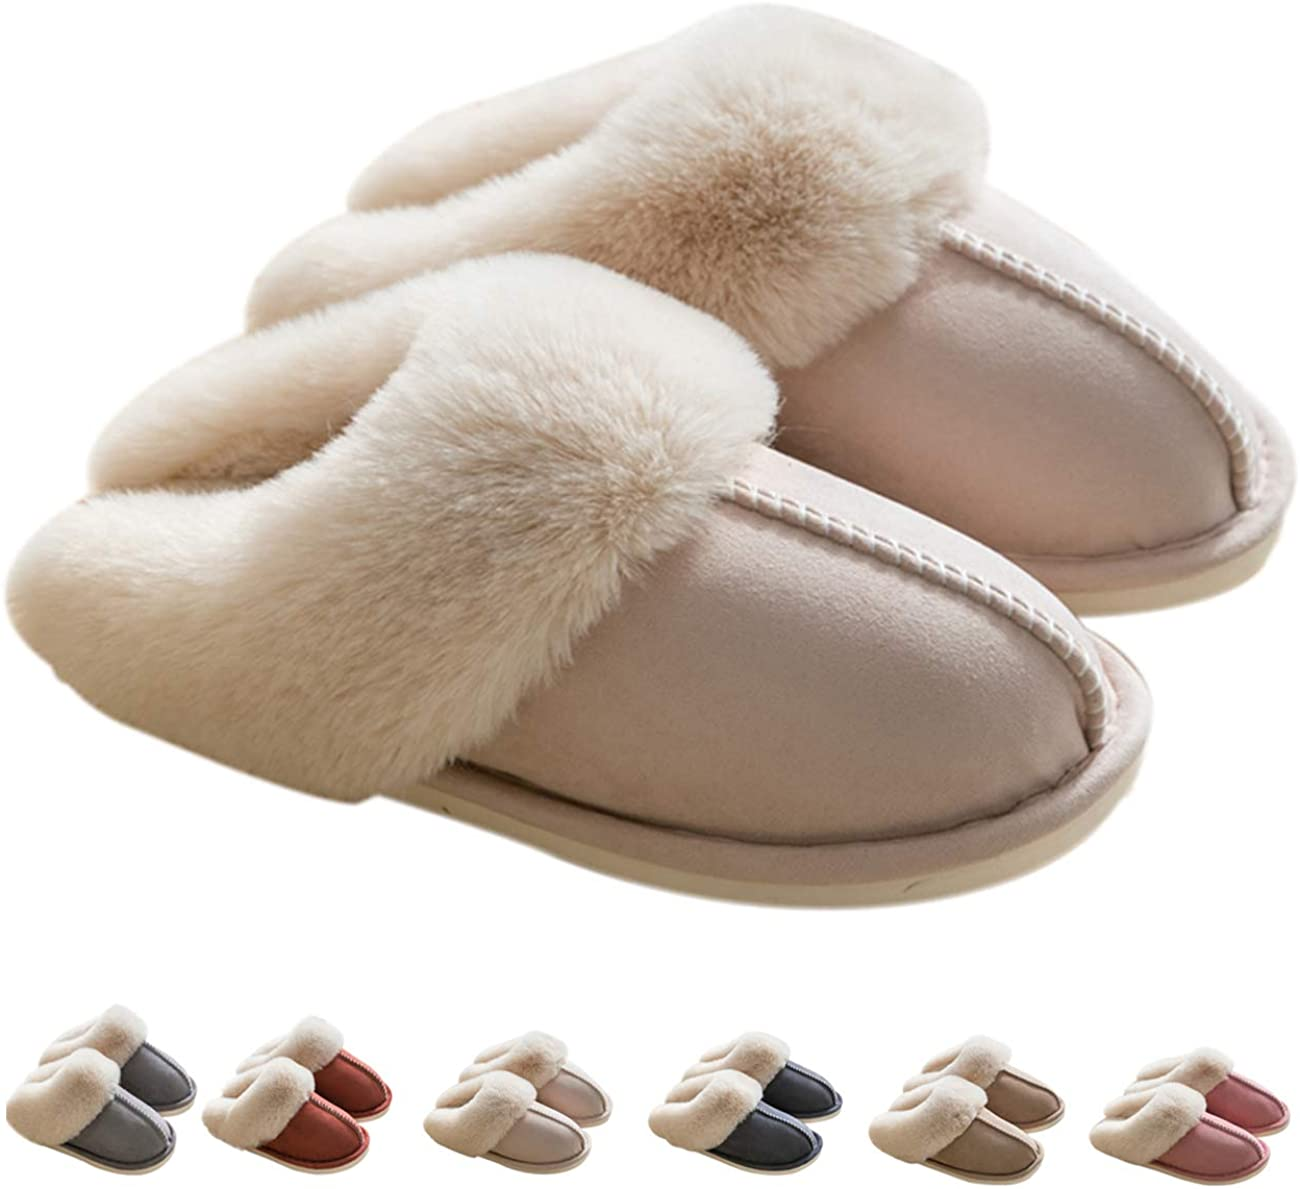 Womens Slipper Memory Foam Fluffy Soft Slip Latest item Hou Ranking TOP11 On Warm Slippers